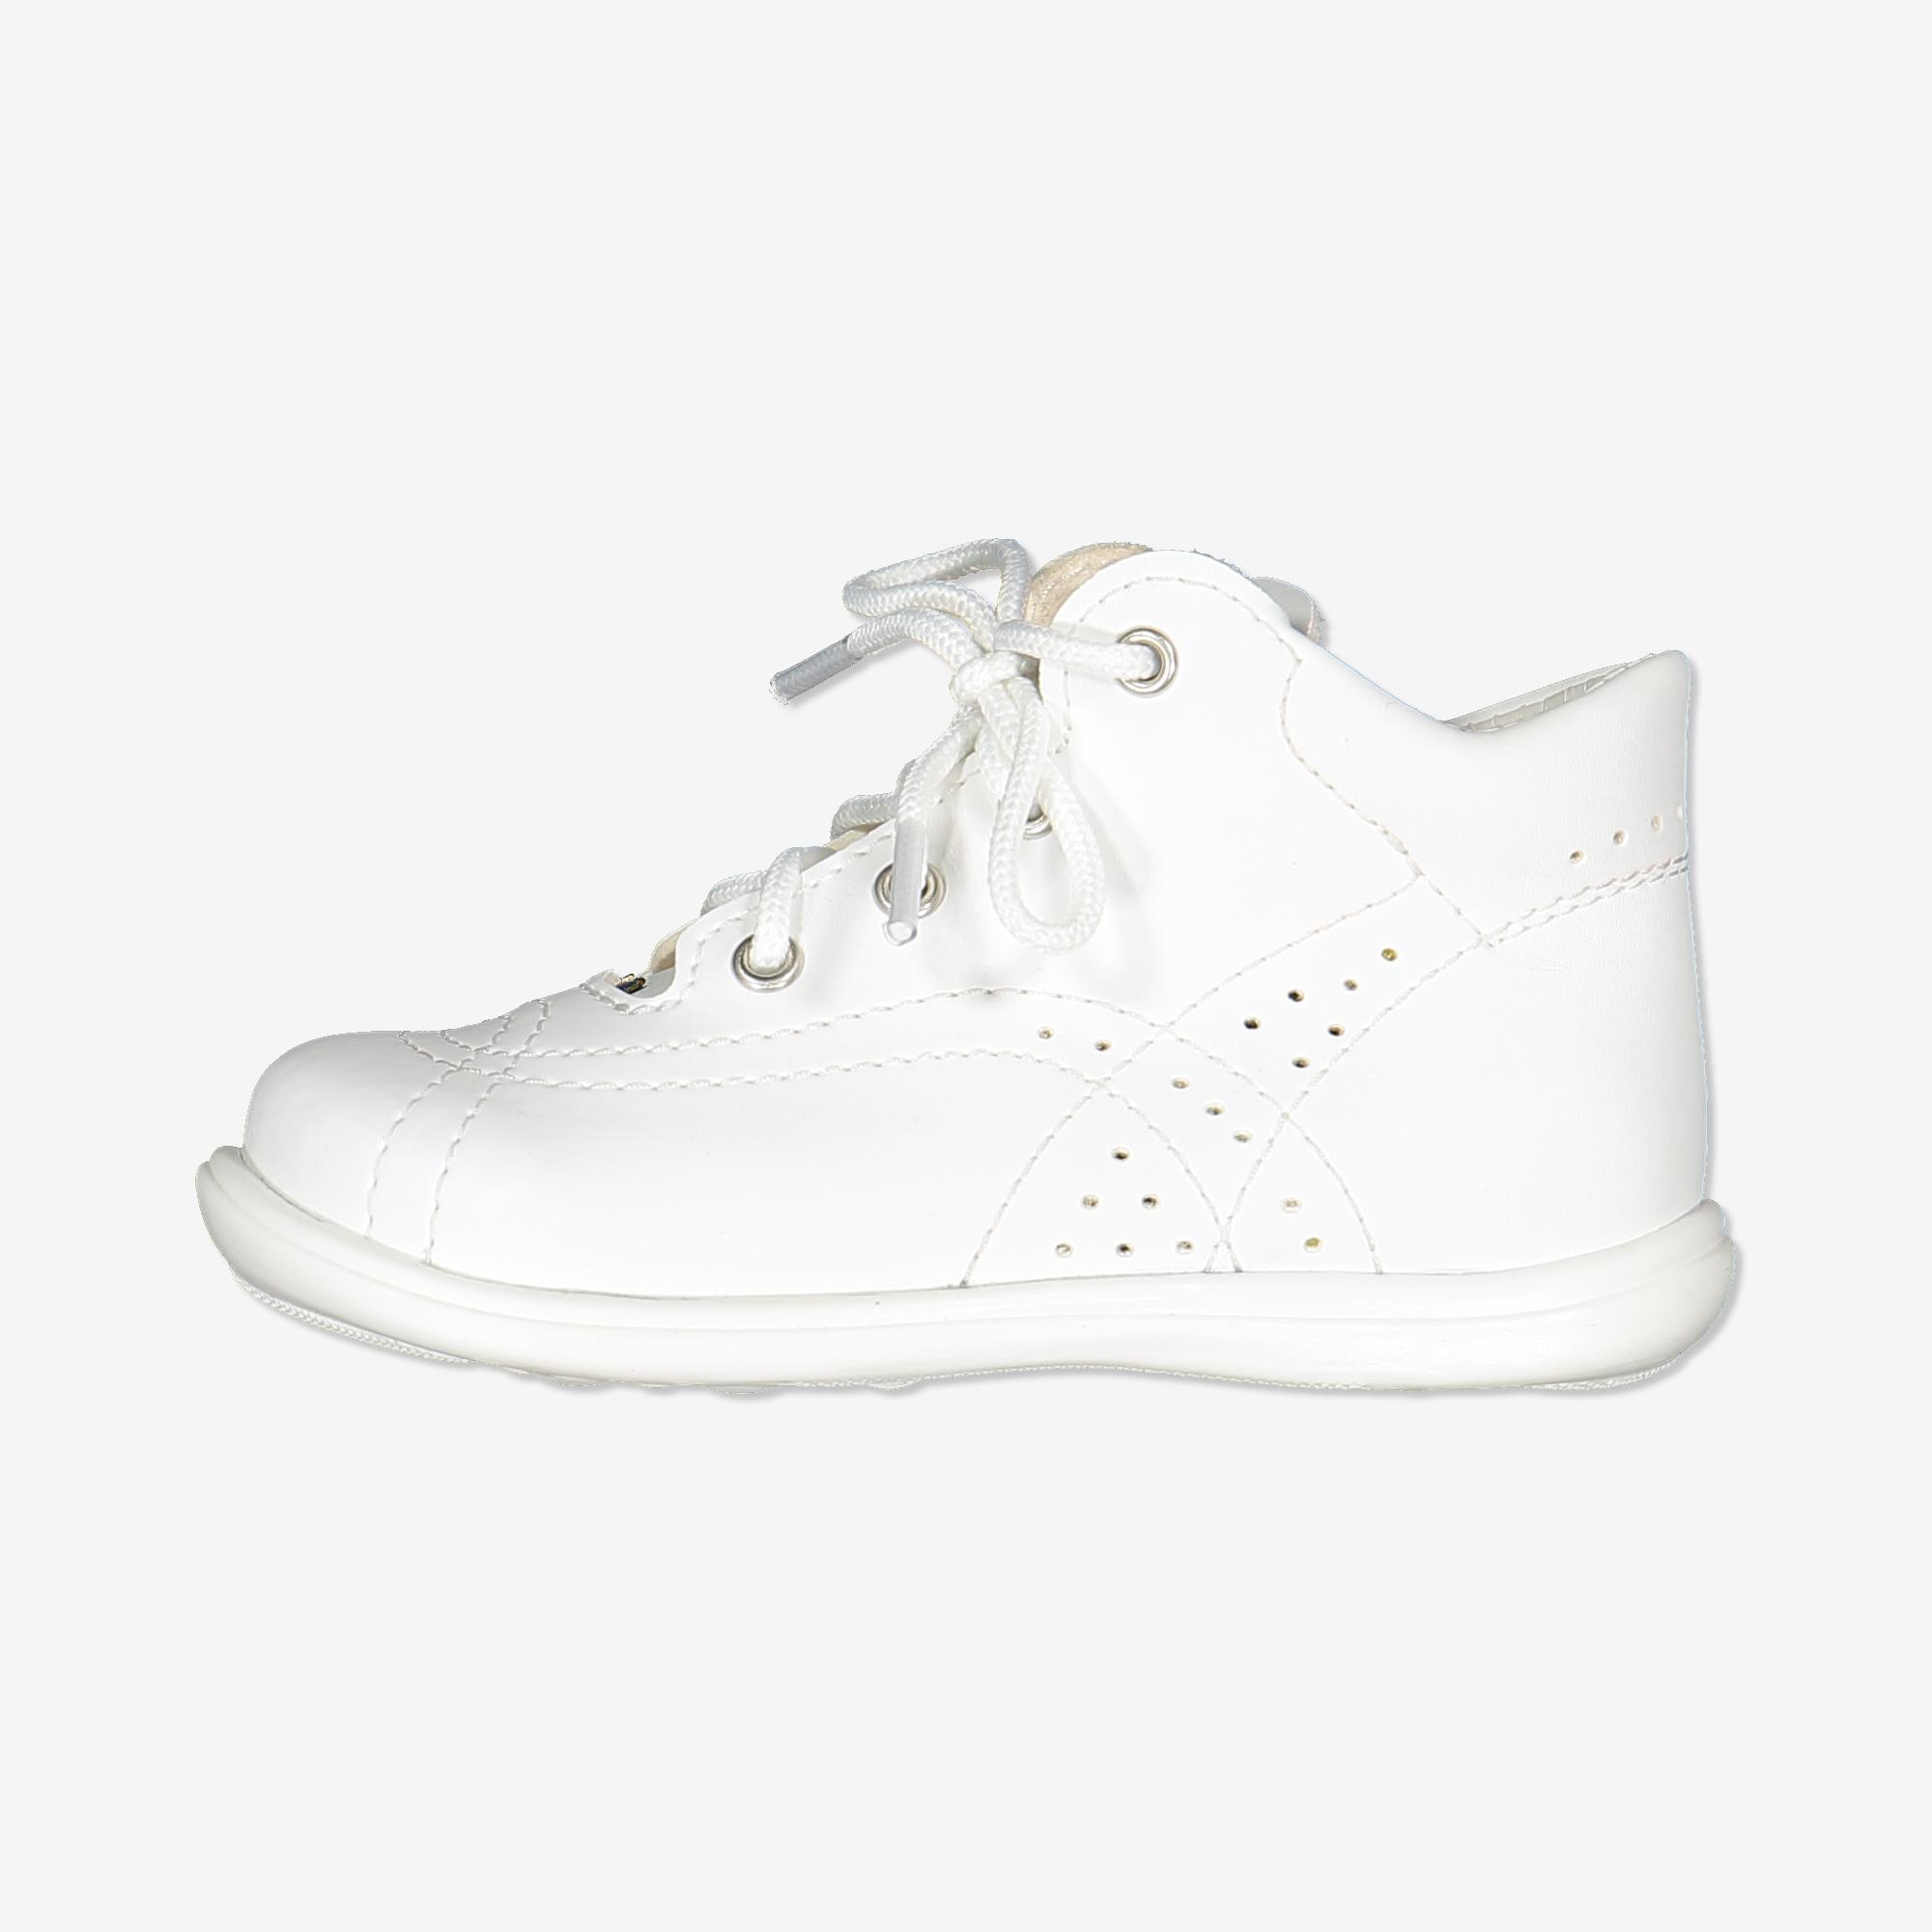 Lära gå sko kavat edsbro xc vit – Polarn O. Pyret